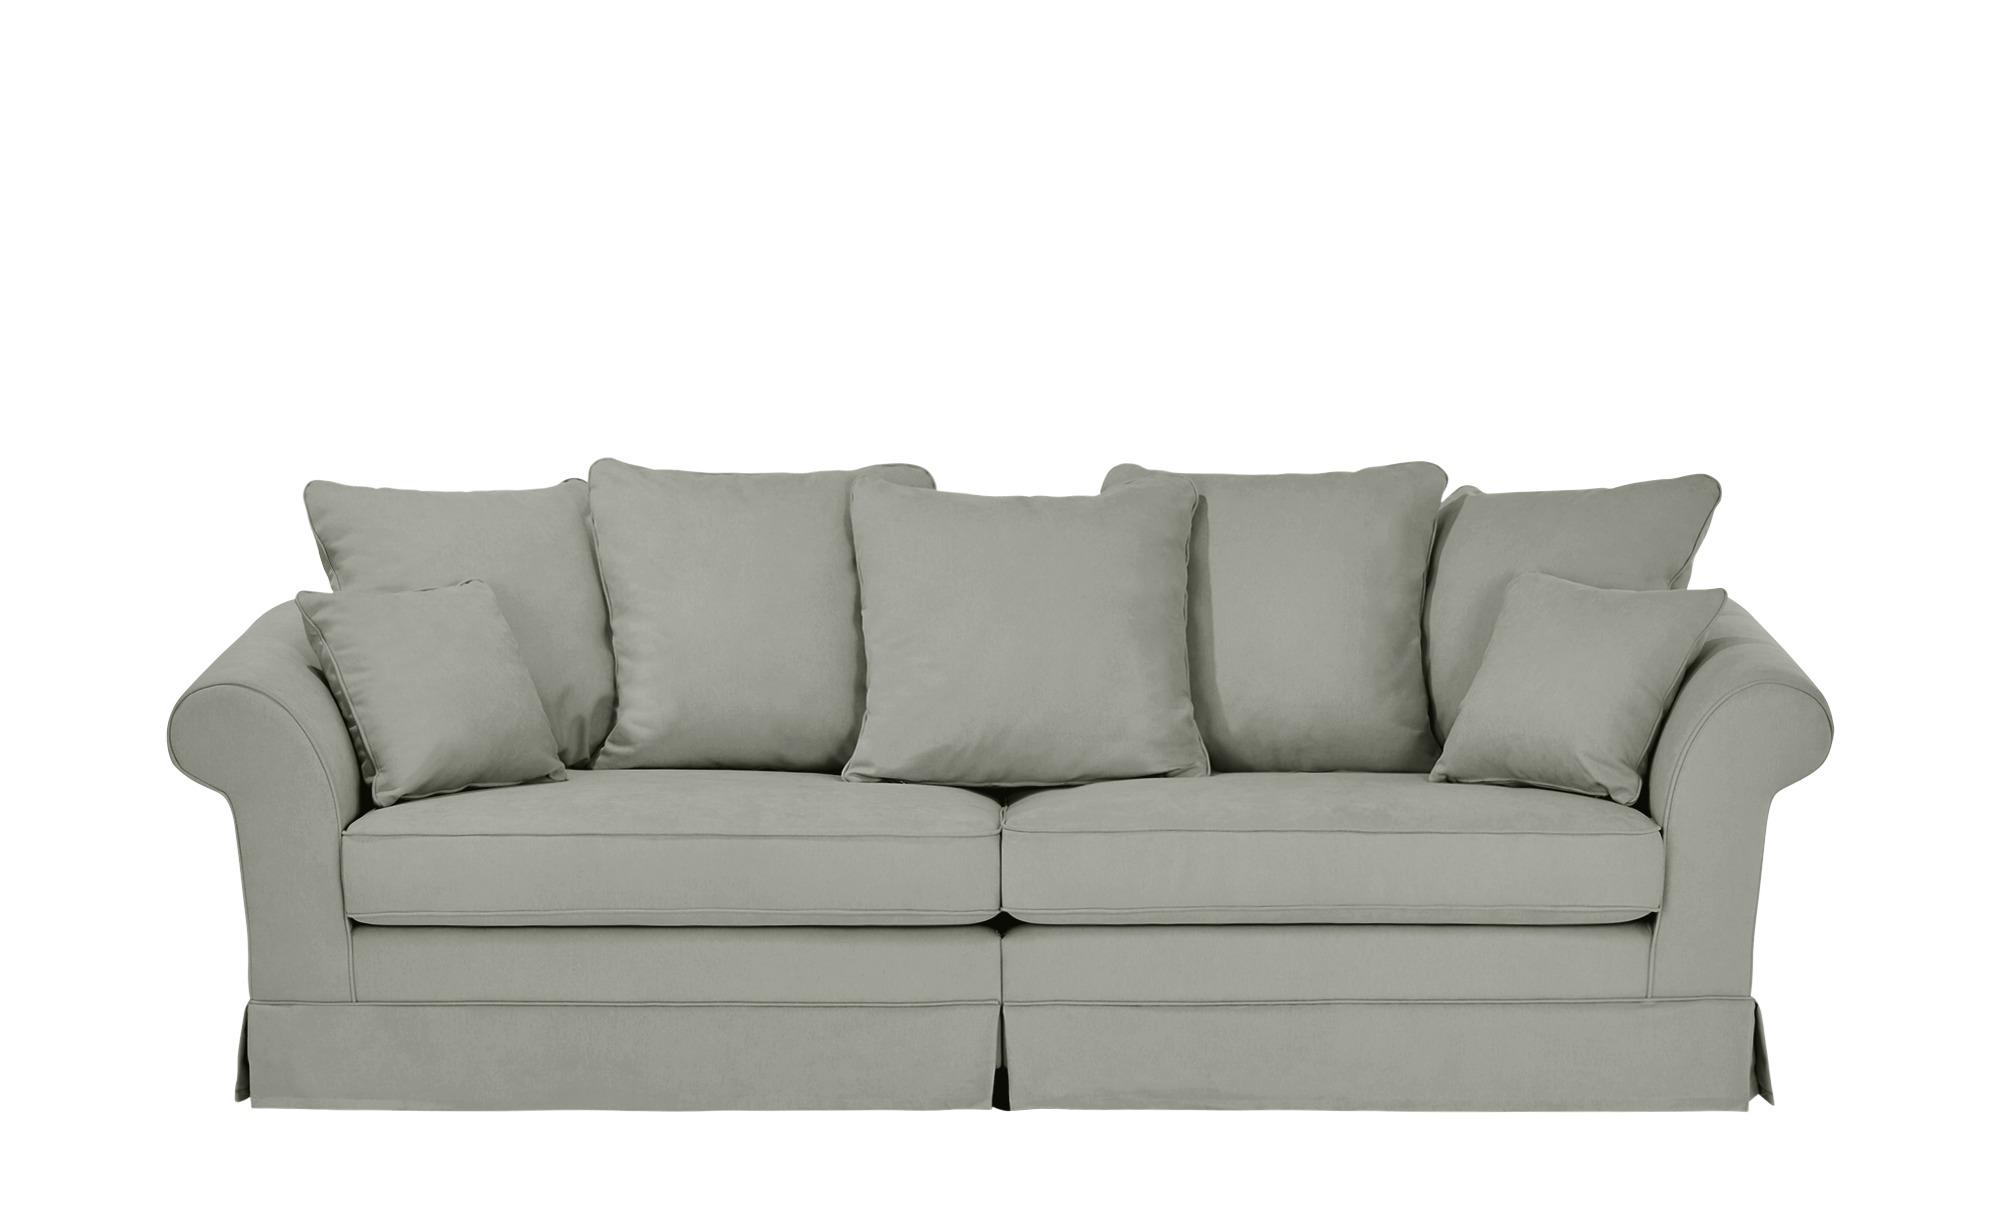 Full Size of Husse Sofa Ikea Stretch 3 Sitzer Ecksofa Couch L Form Otto Bezug Hochwertig Wohnlandschaft Sofahusse Weiss Hussen Waschbar Ottomane Links Megasofa Hampton Sofa Husse Sofa